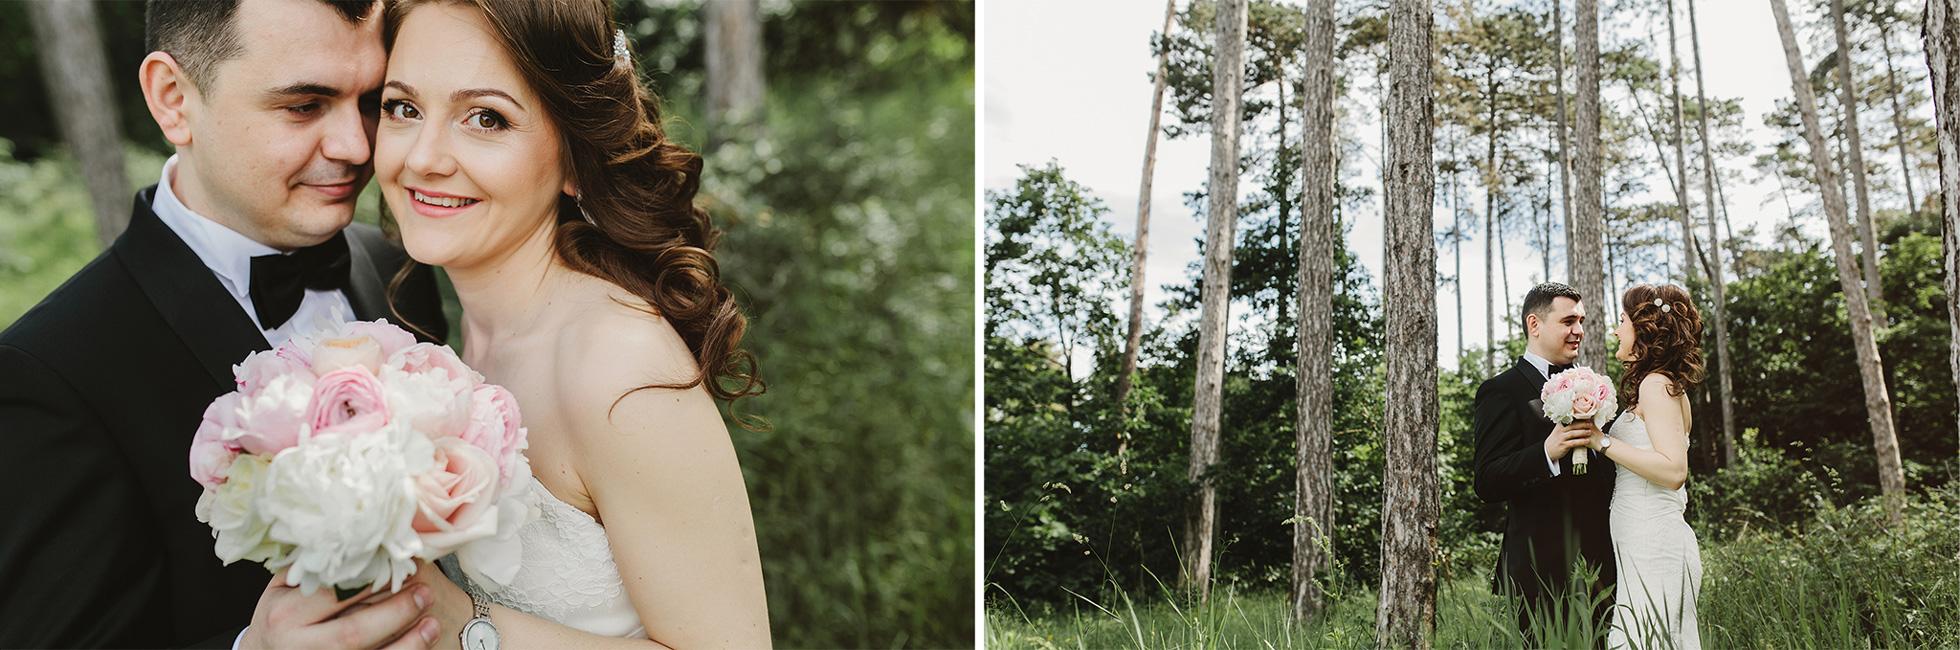 Liana-+-Florin-{wedding}-040